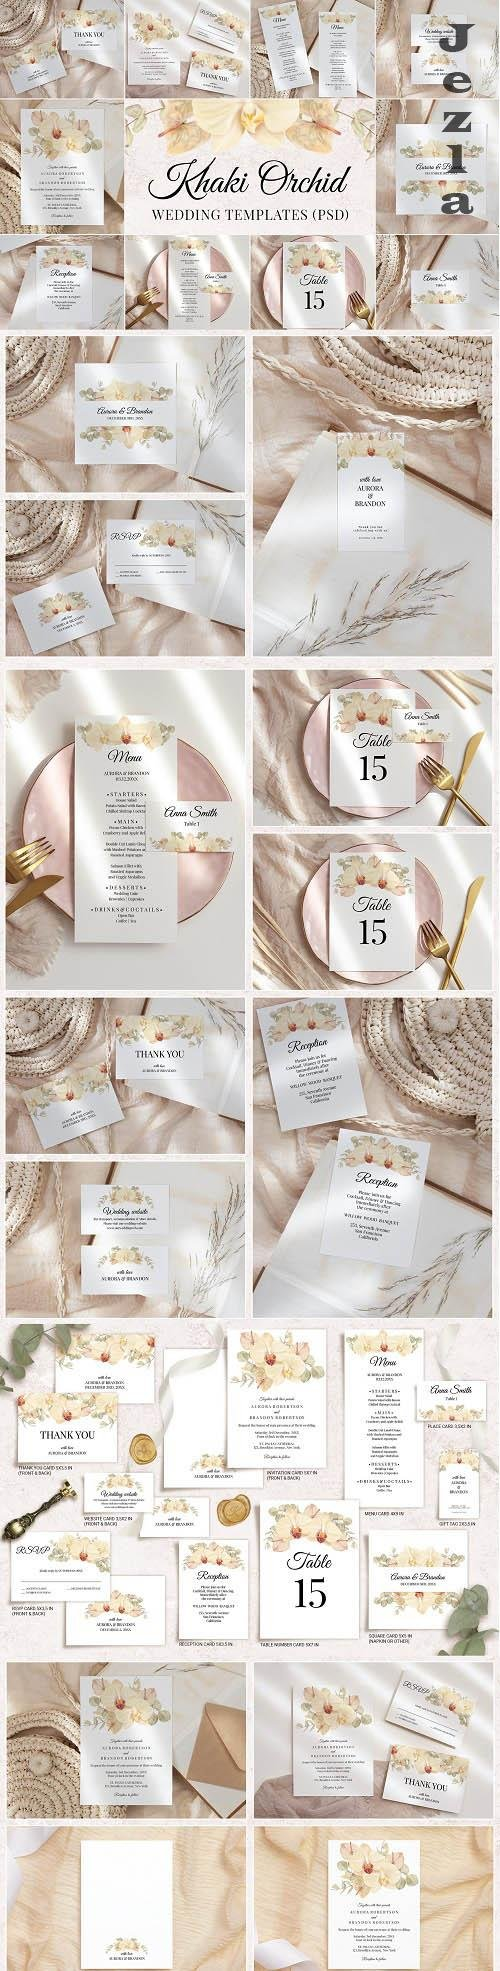 Boho Wedding Template Cards Floral Invitation Set - 1433764